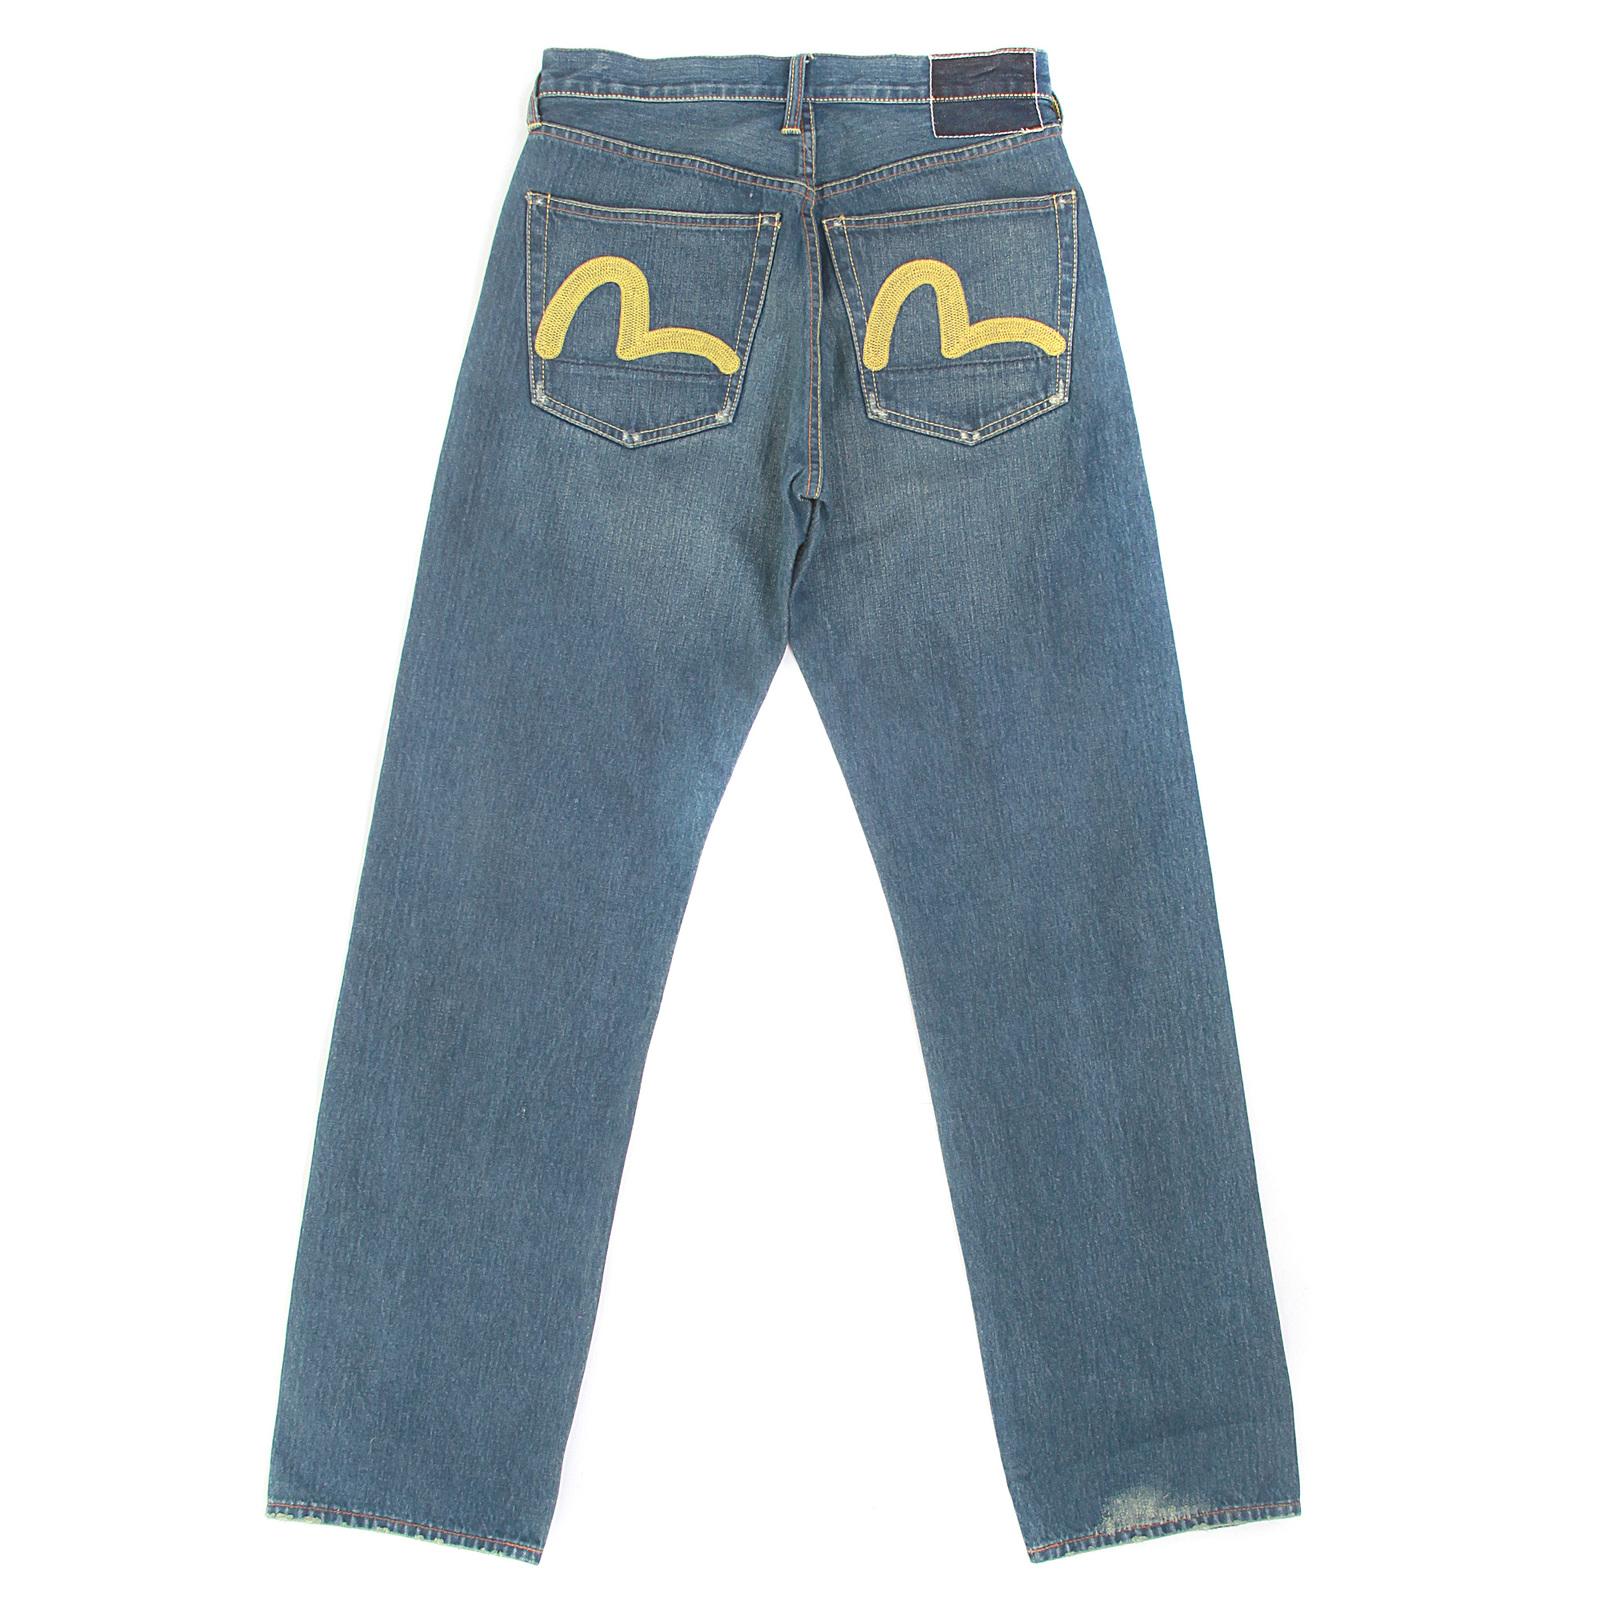 668ebac3dbcc Stonewashed Mens Selvedge Denim Jeans by Evisu Clothing